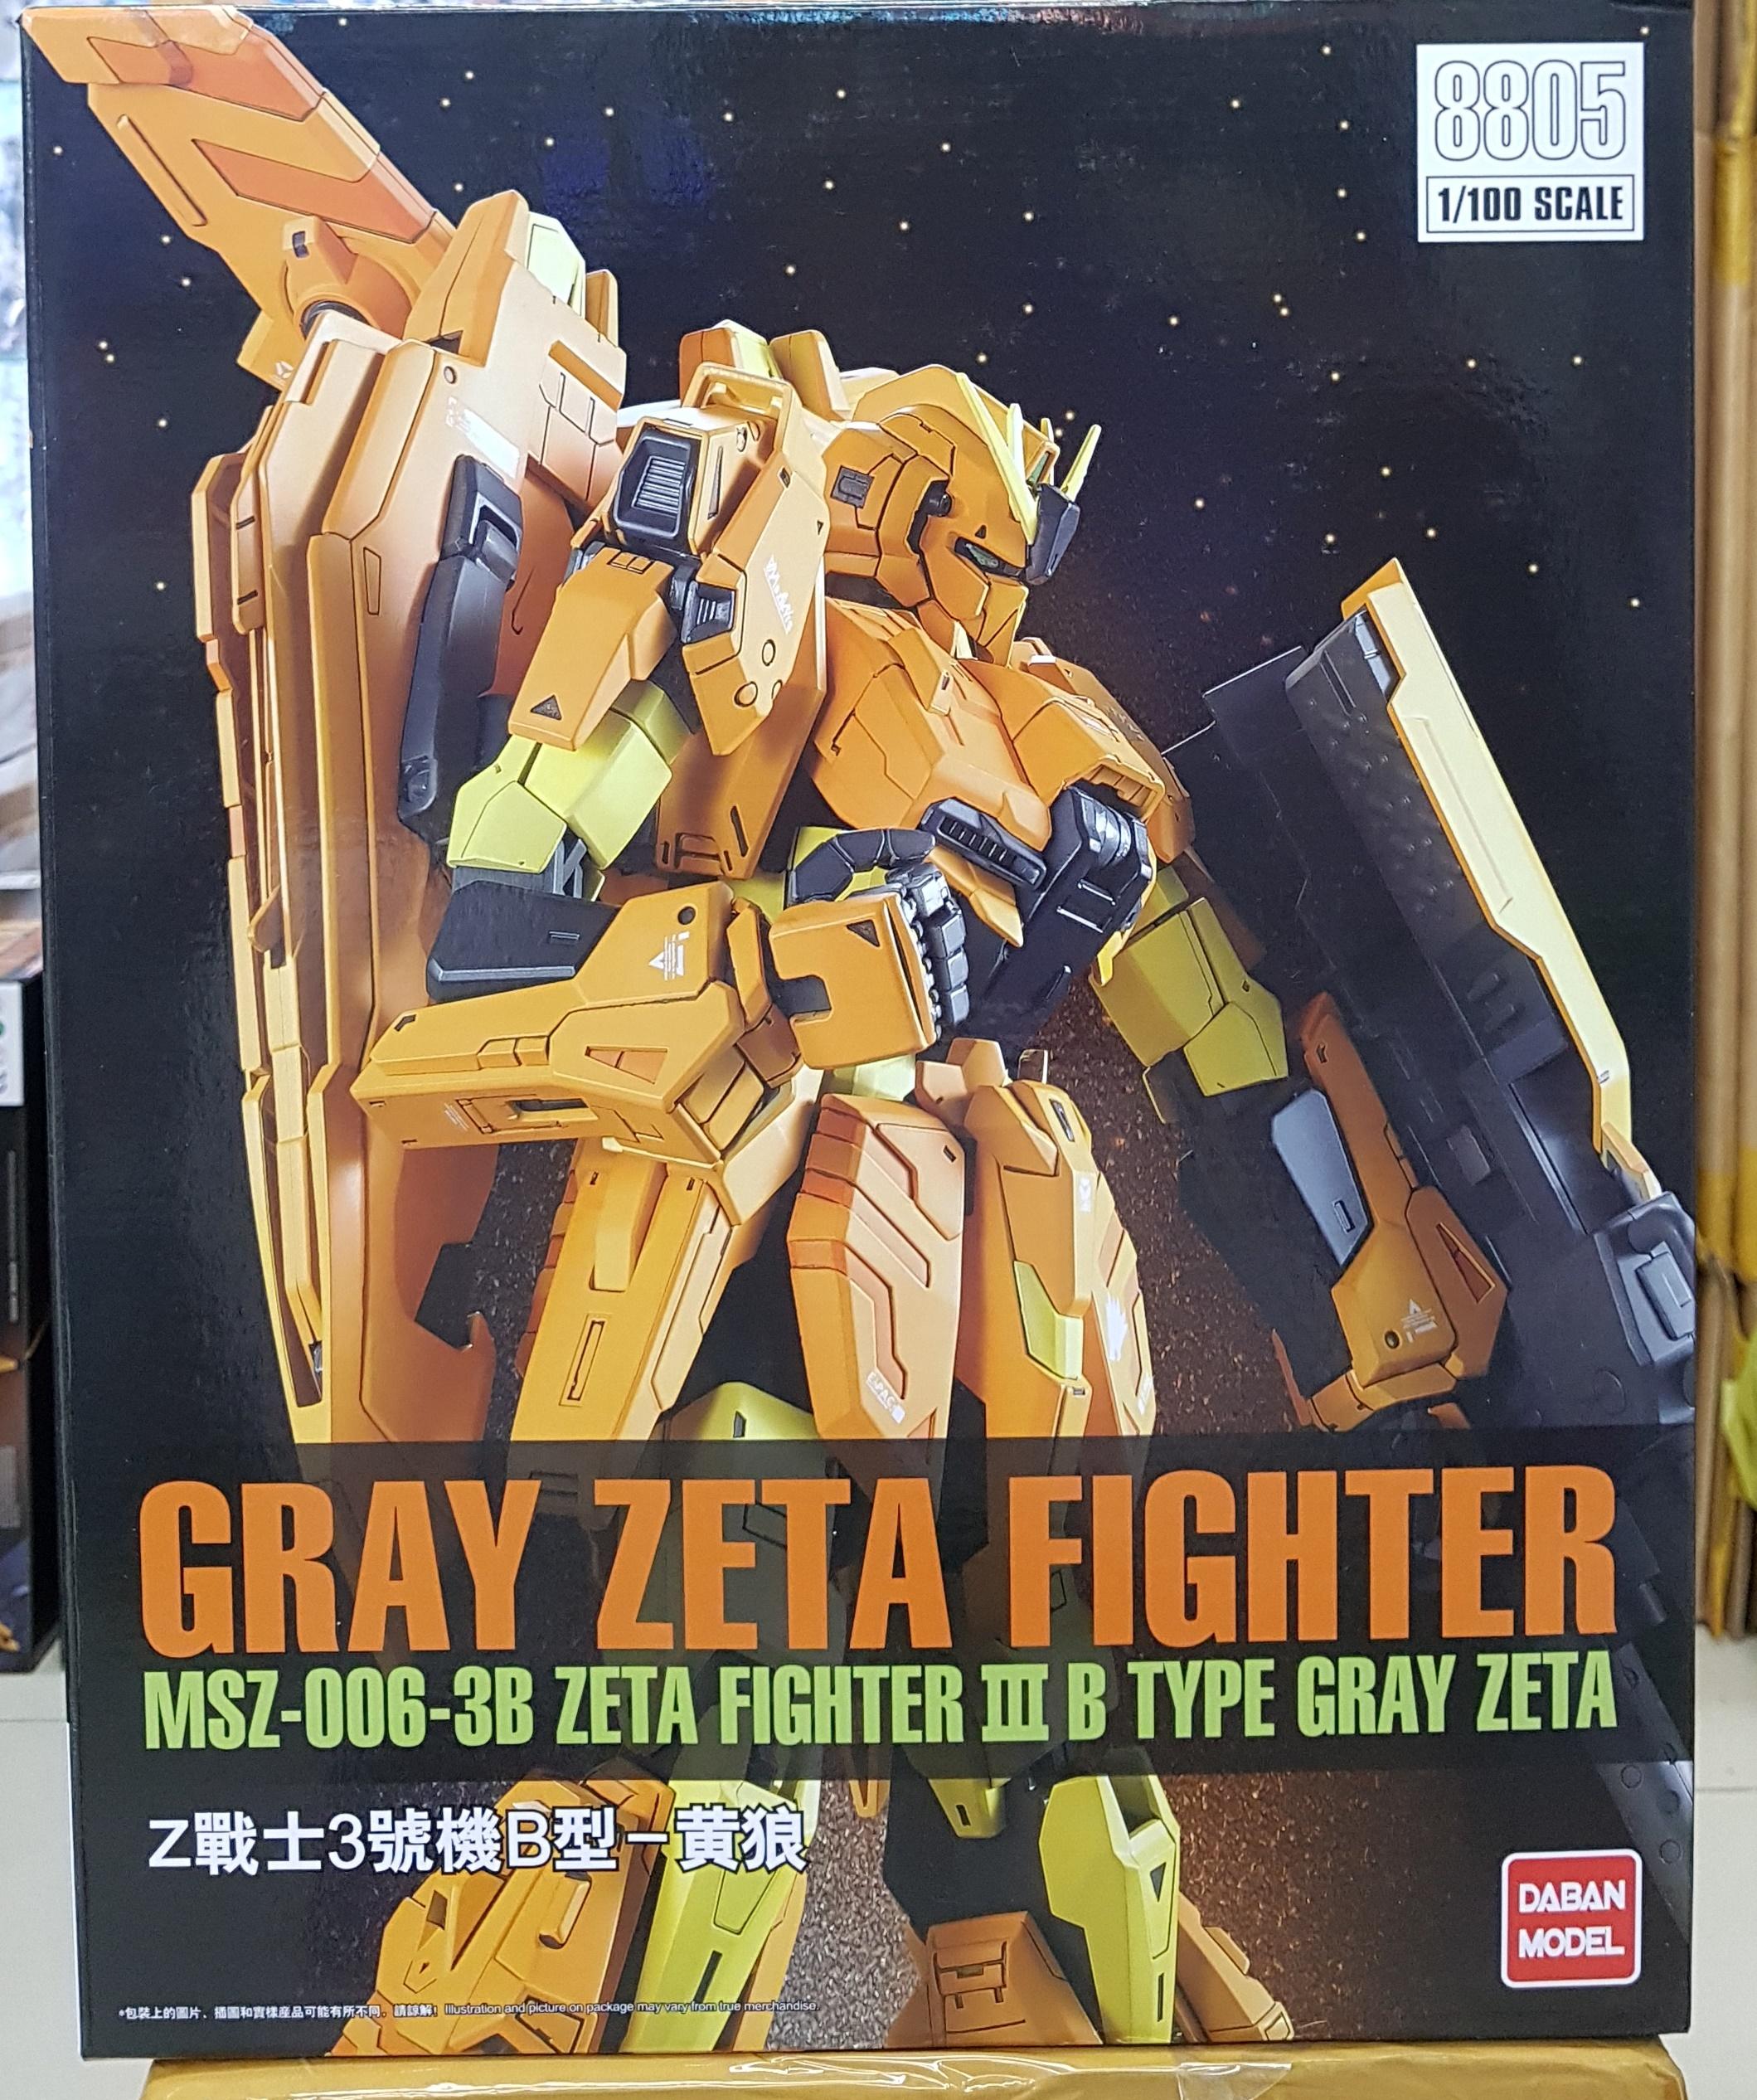 GRAY ZETA FIGHTER [Daban] 8805